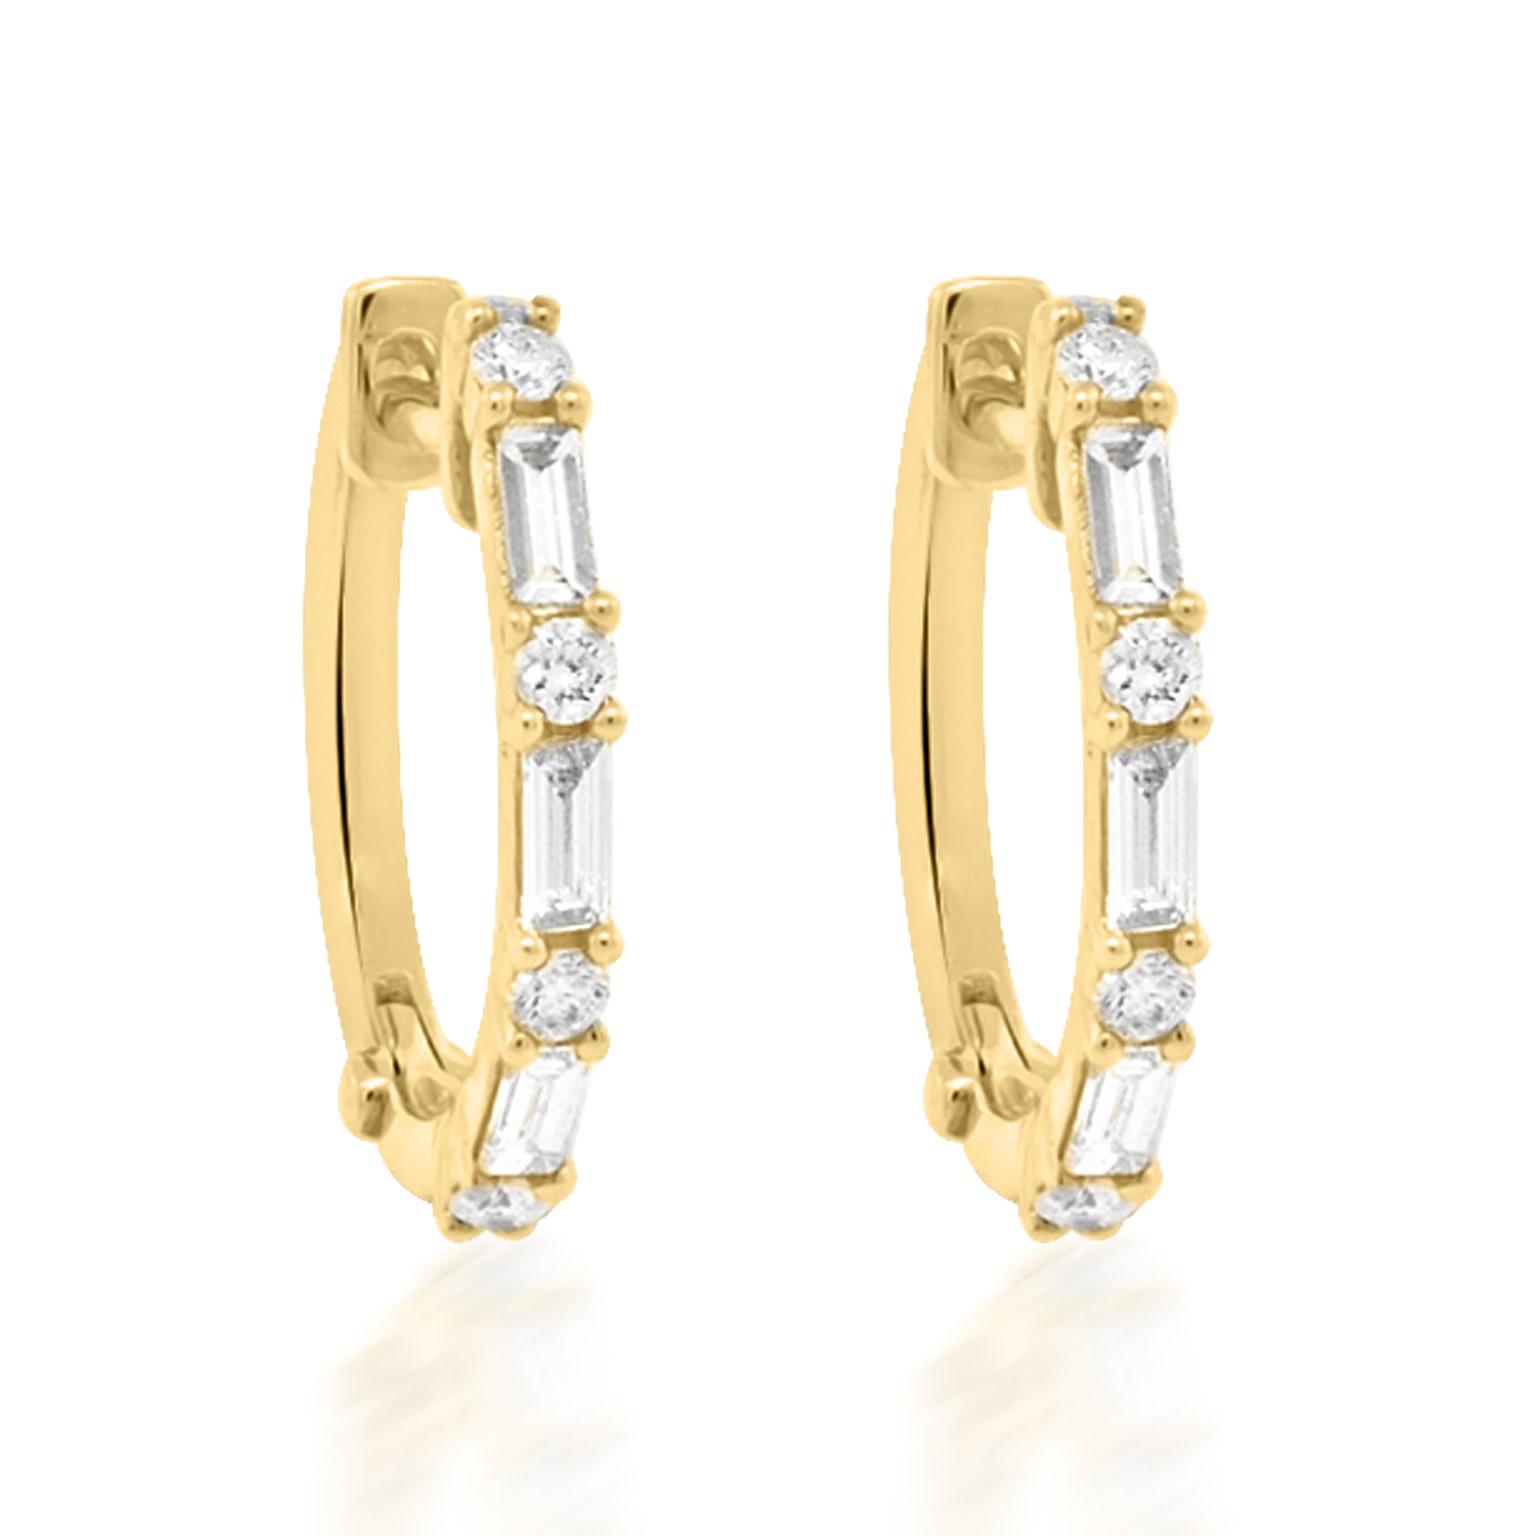 Trabert Goldsmiths Baguette and Round Diamond Hoop Earrings